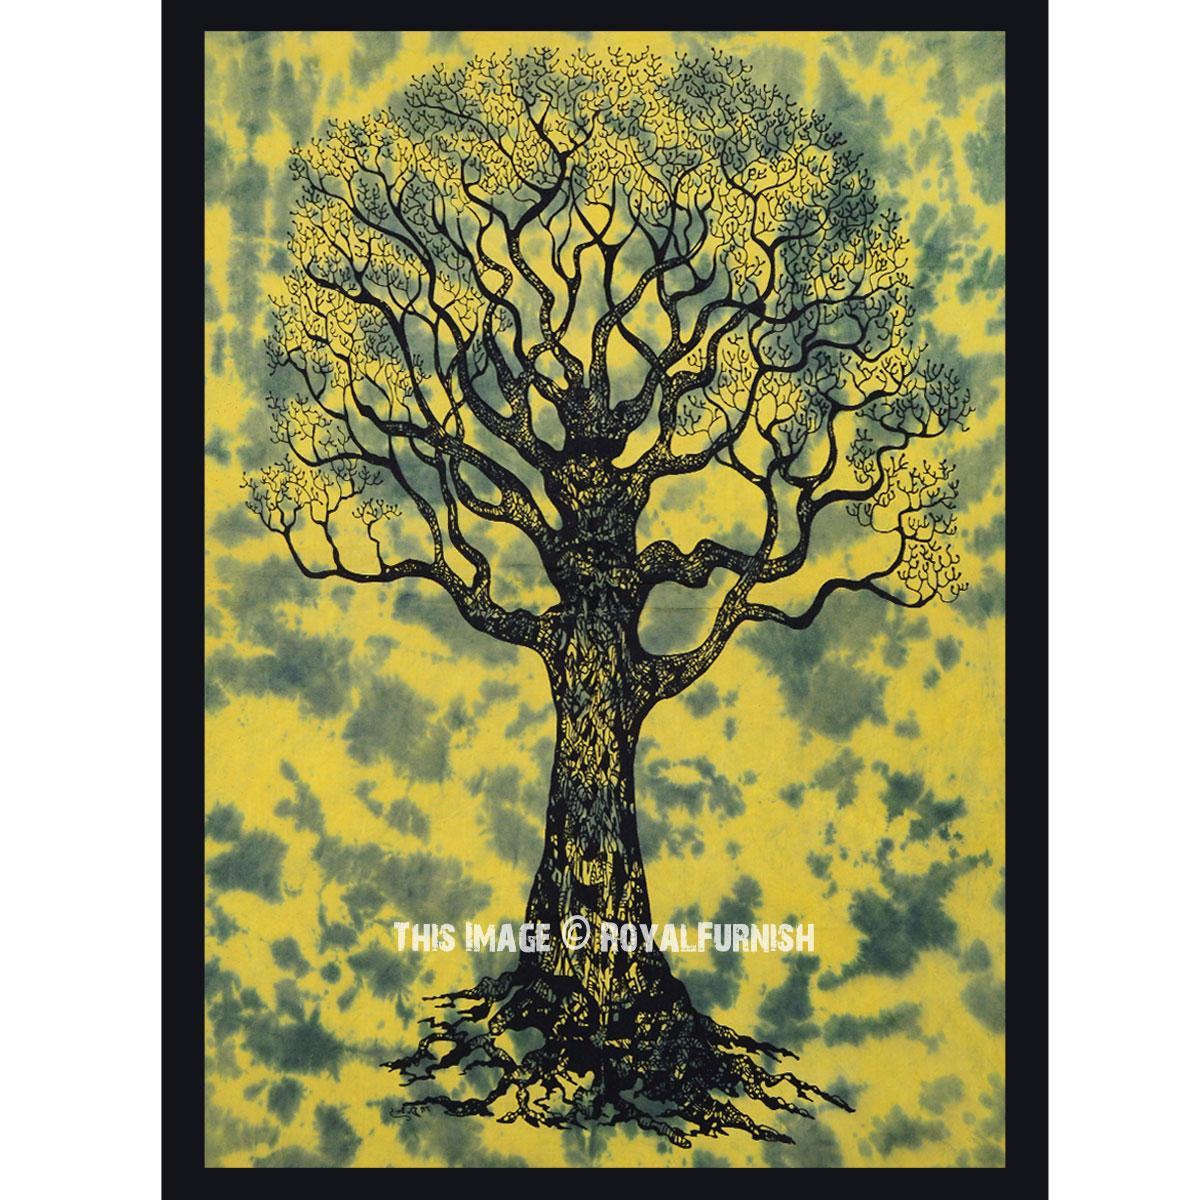 Green Multi Tie Dye Desert Dry Tree Cotton Fabric Poster Wall Art ...